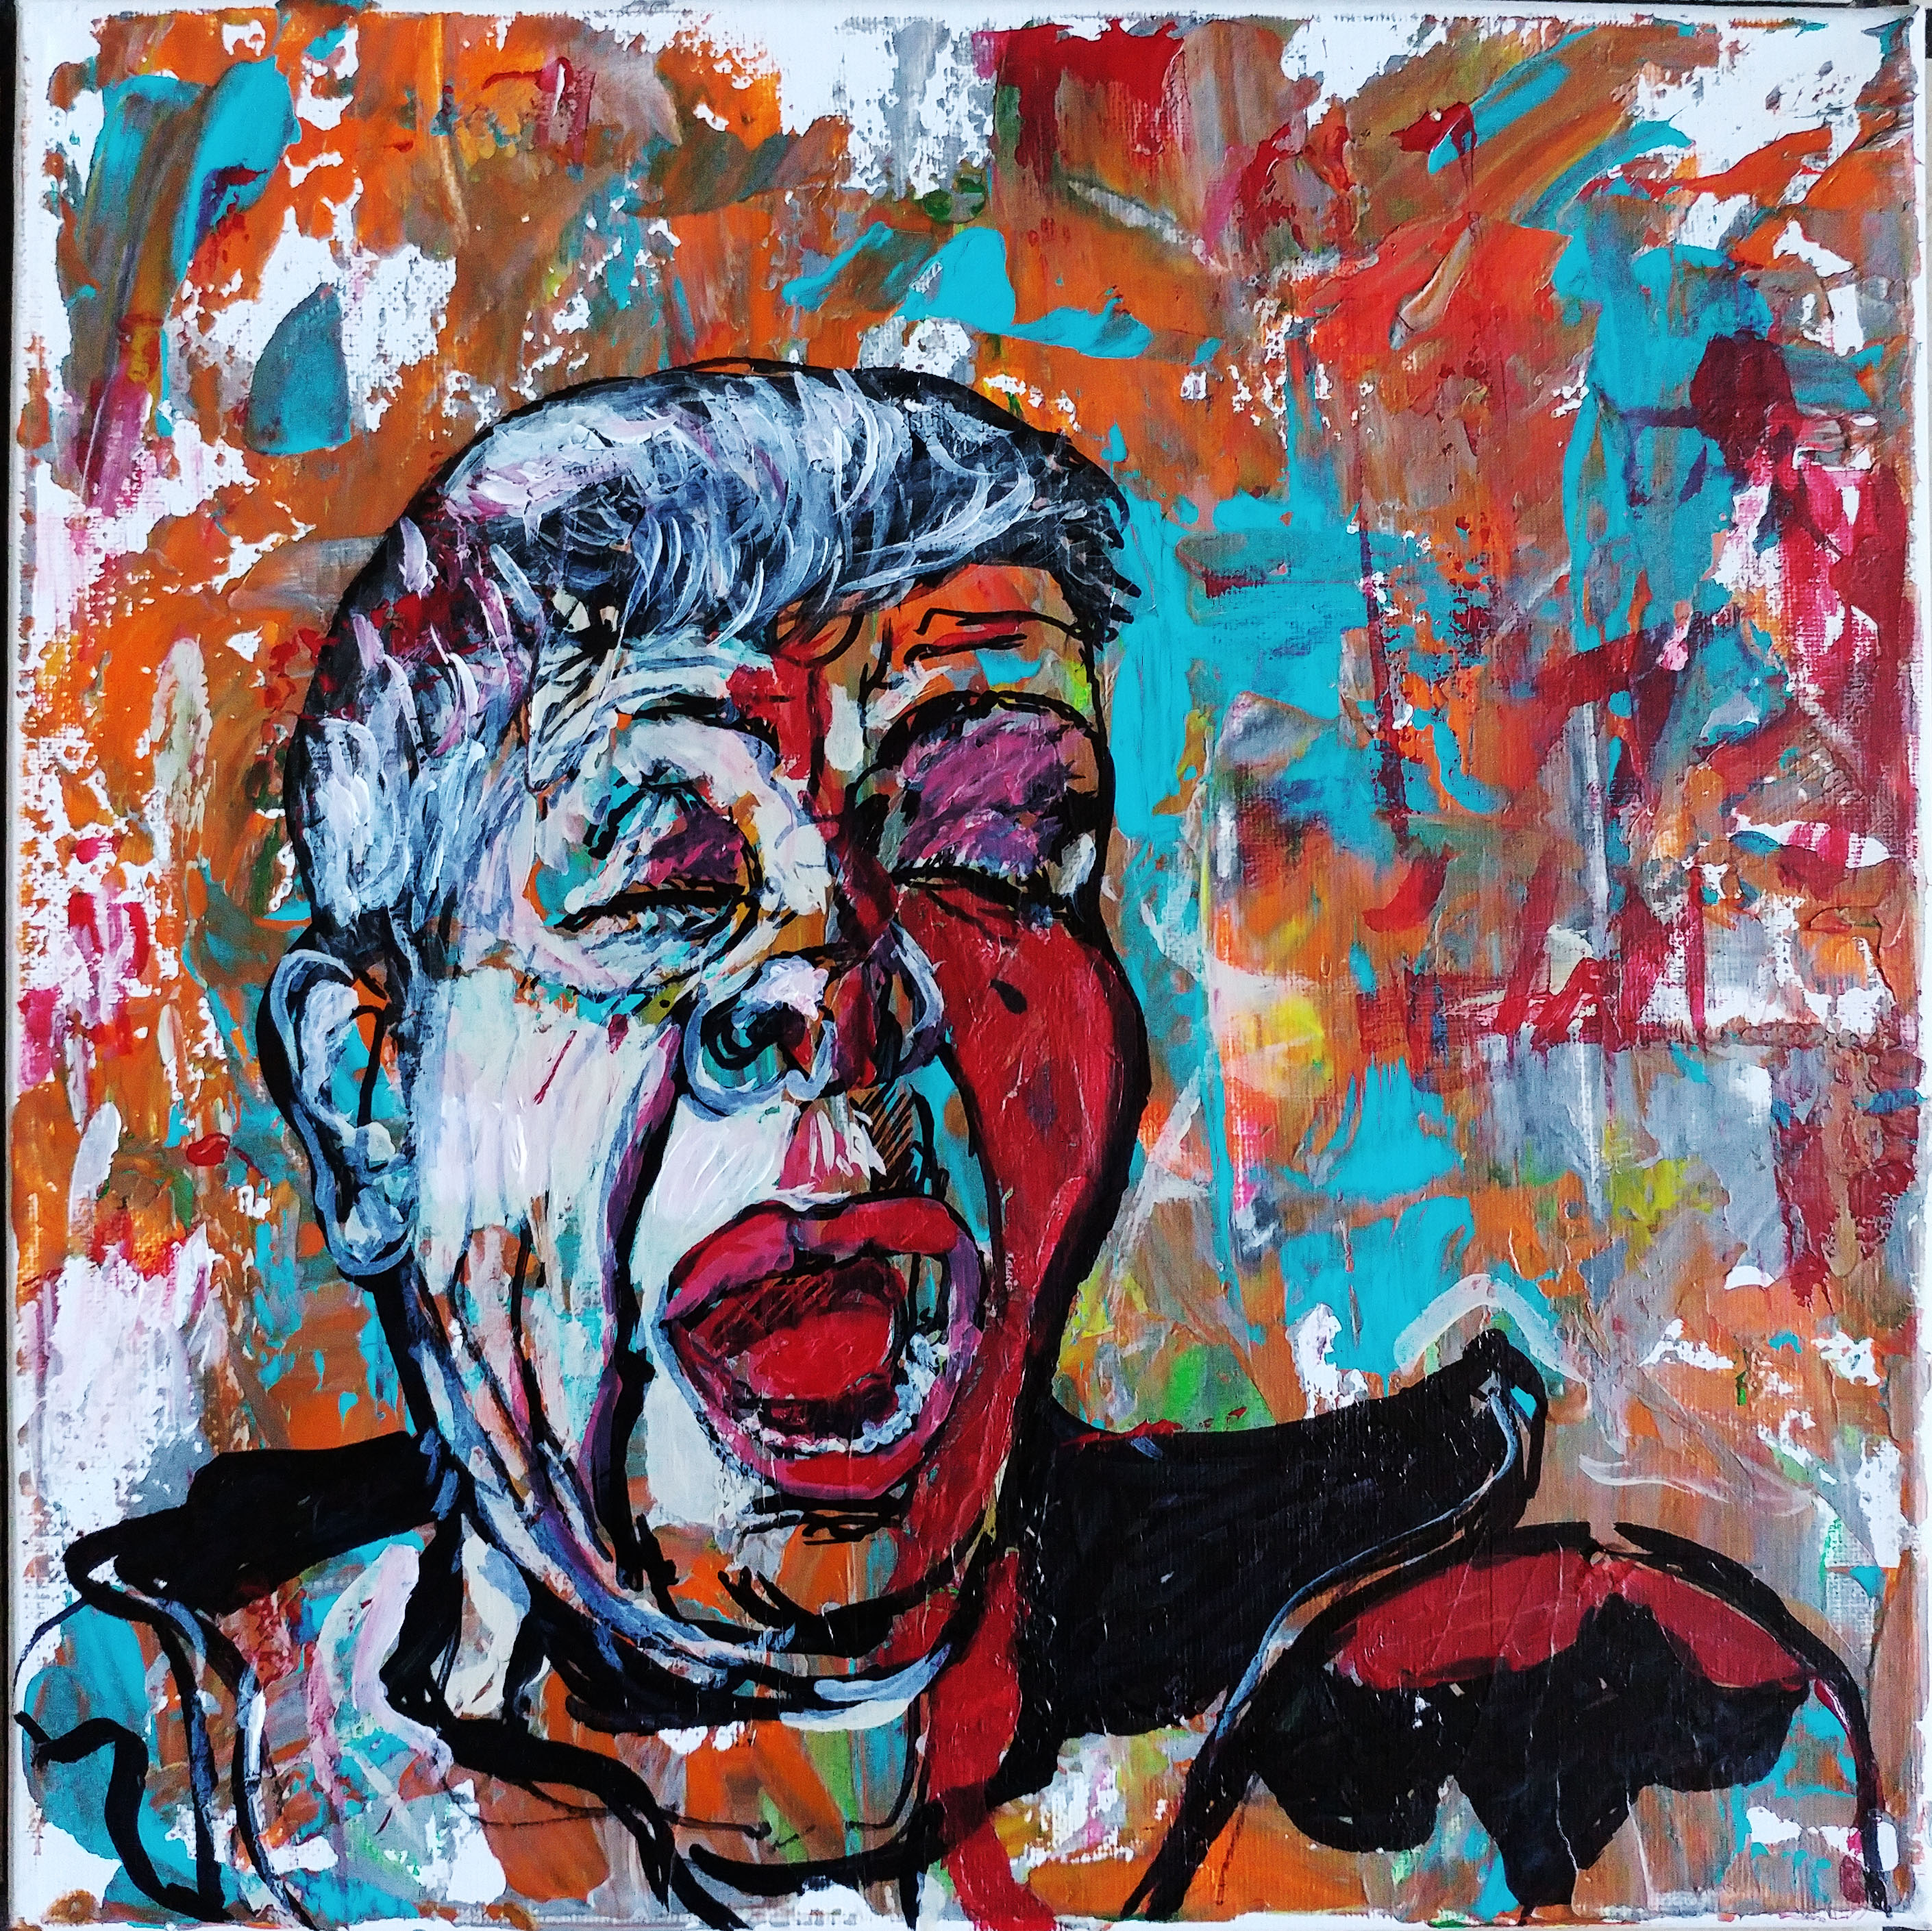 Yawning Erzsi (2017)